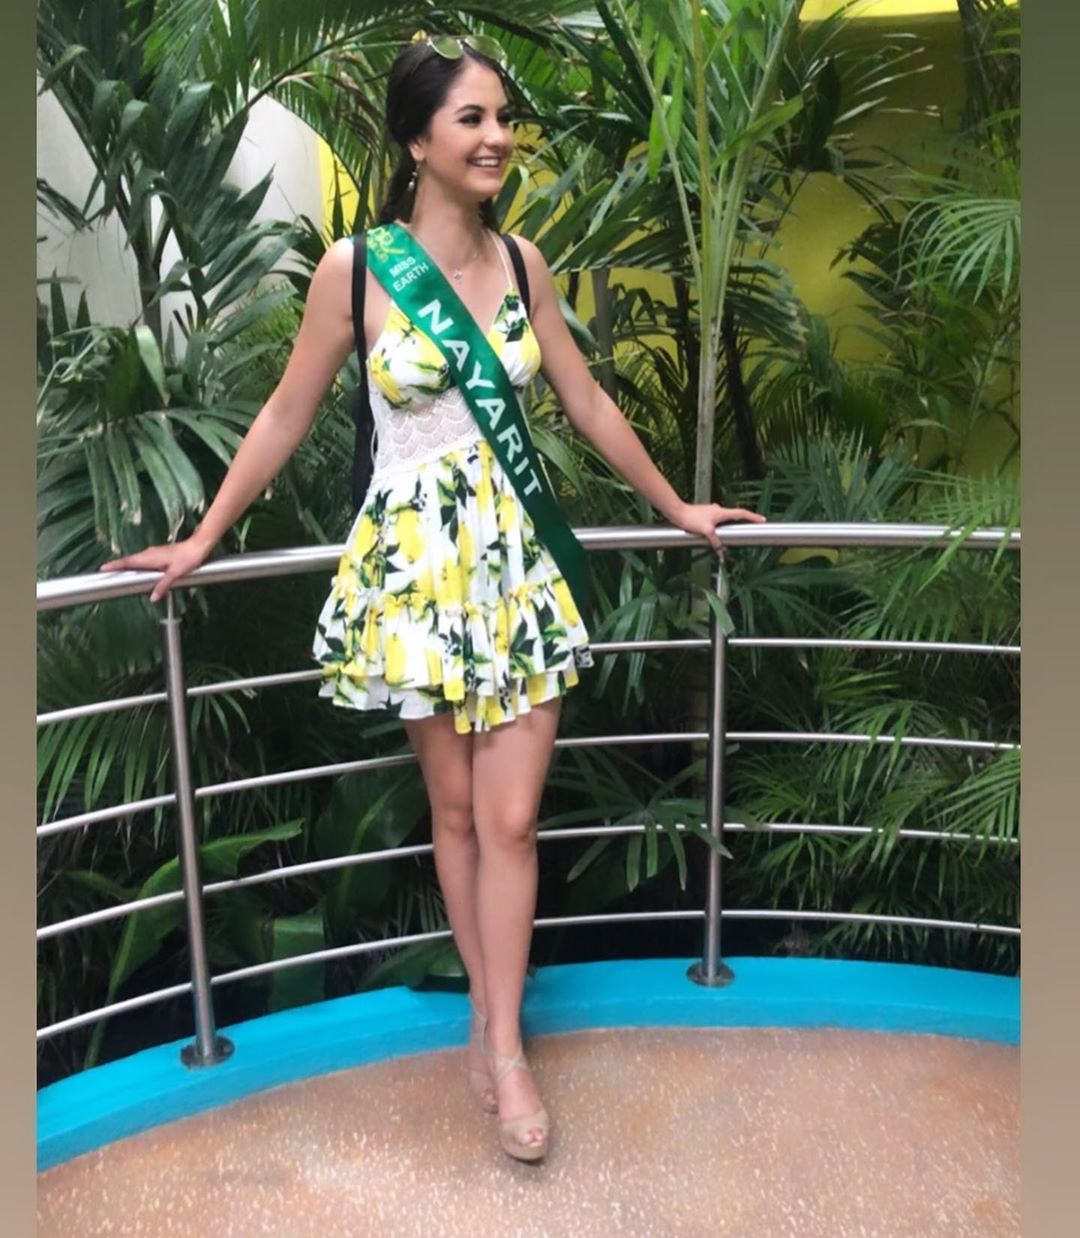 hilary islas, miss earth mexico 2019. - Página 6 60600610